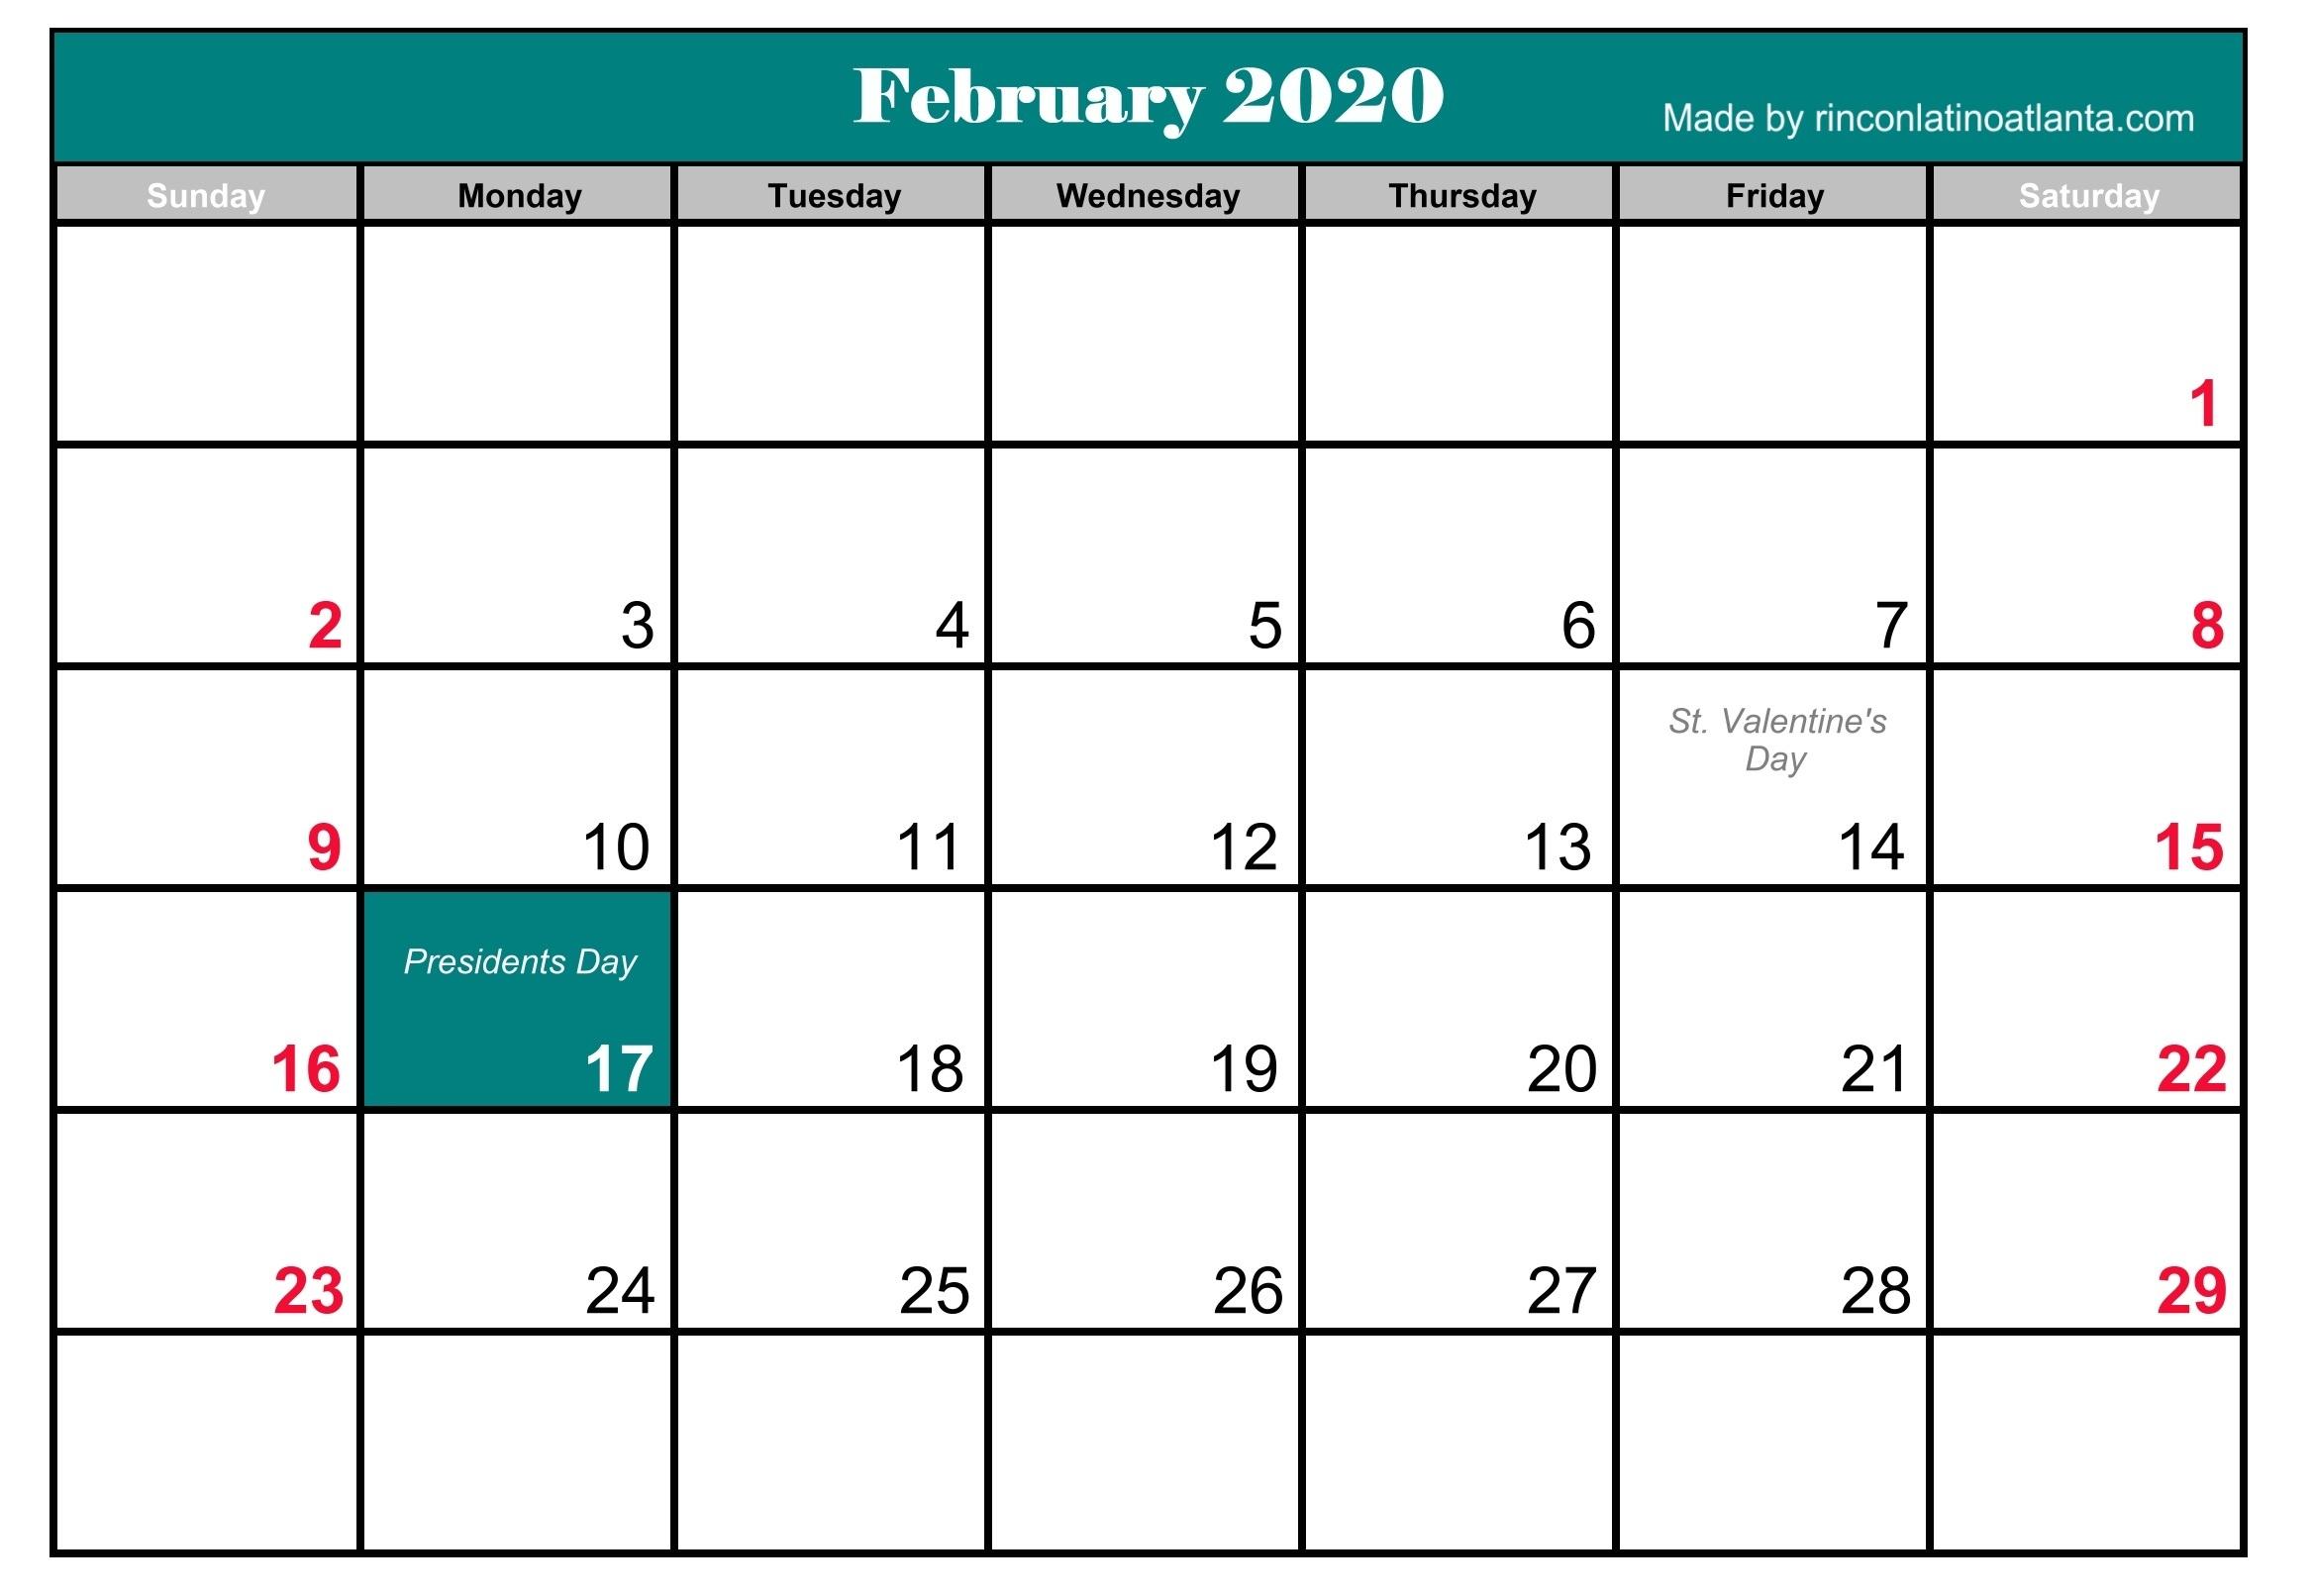 February Calendar 2020 Template